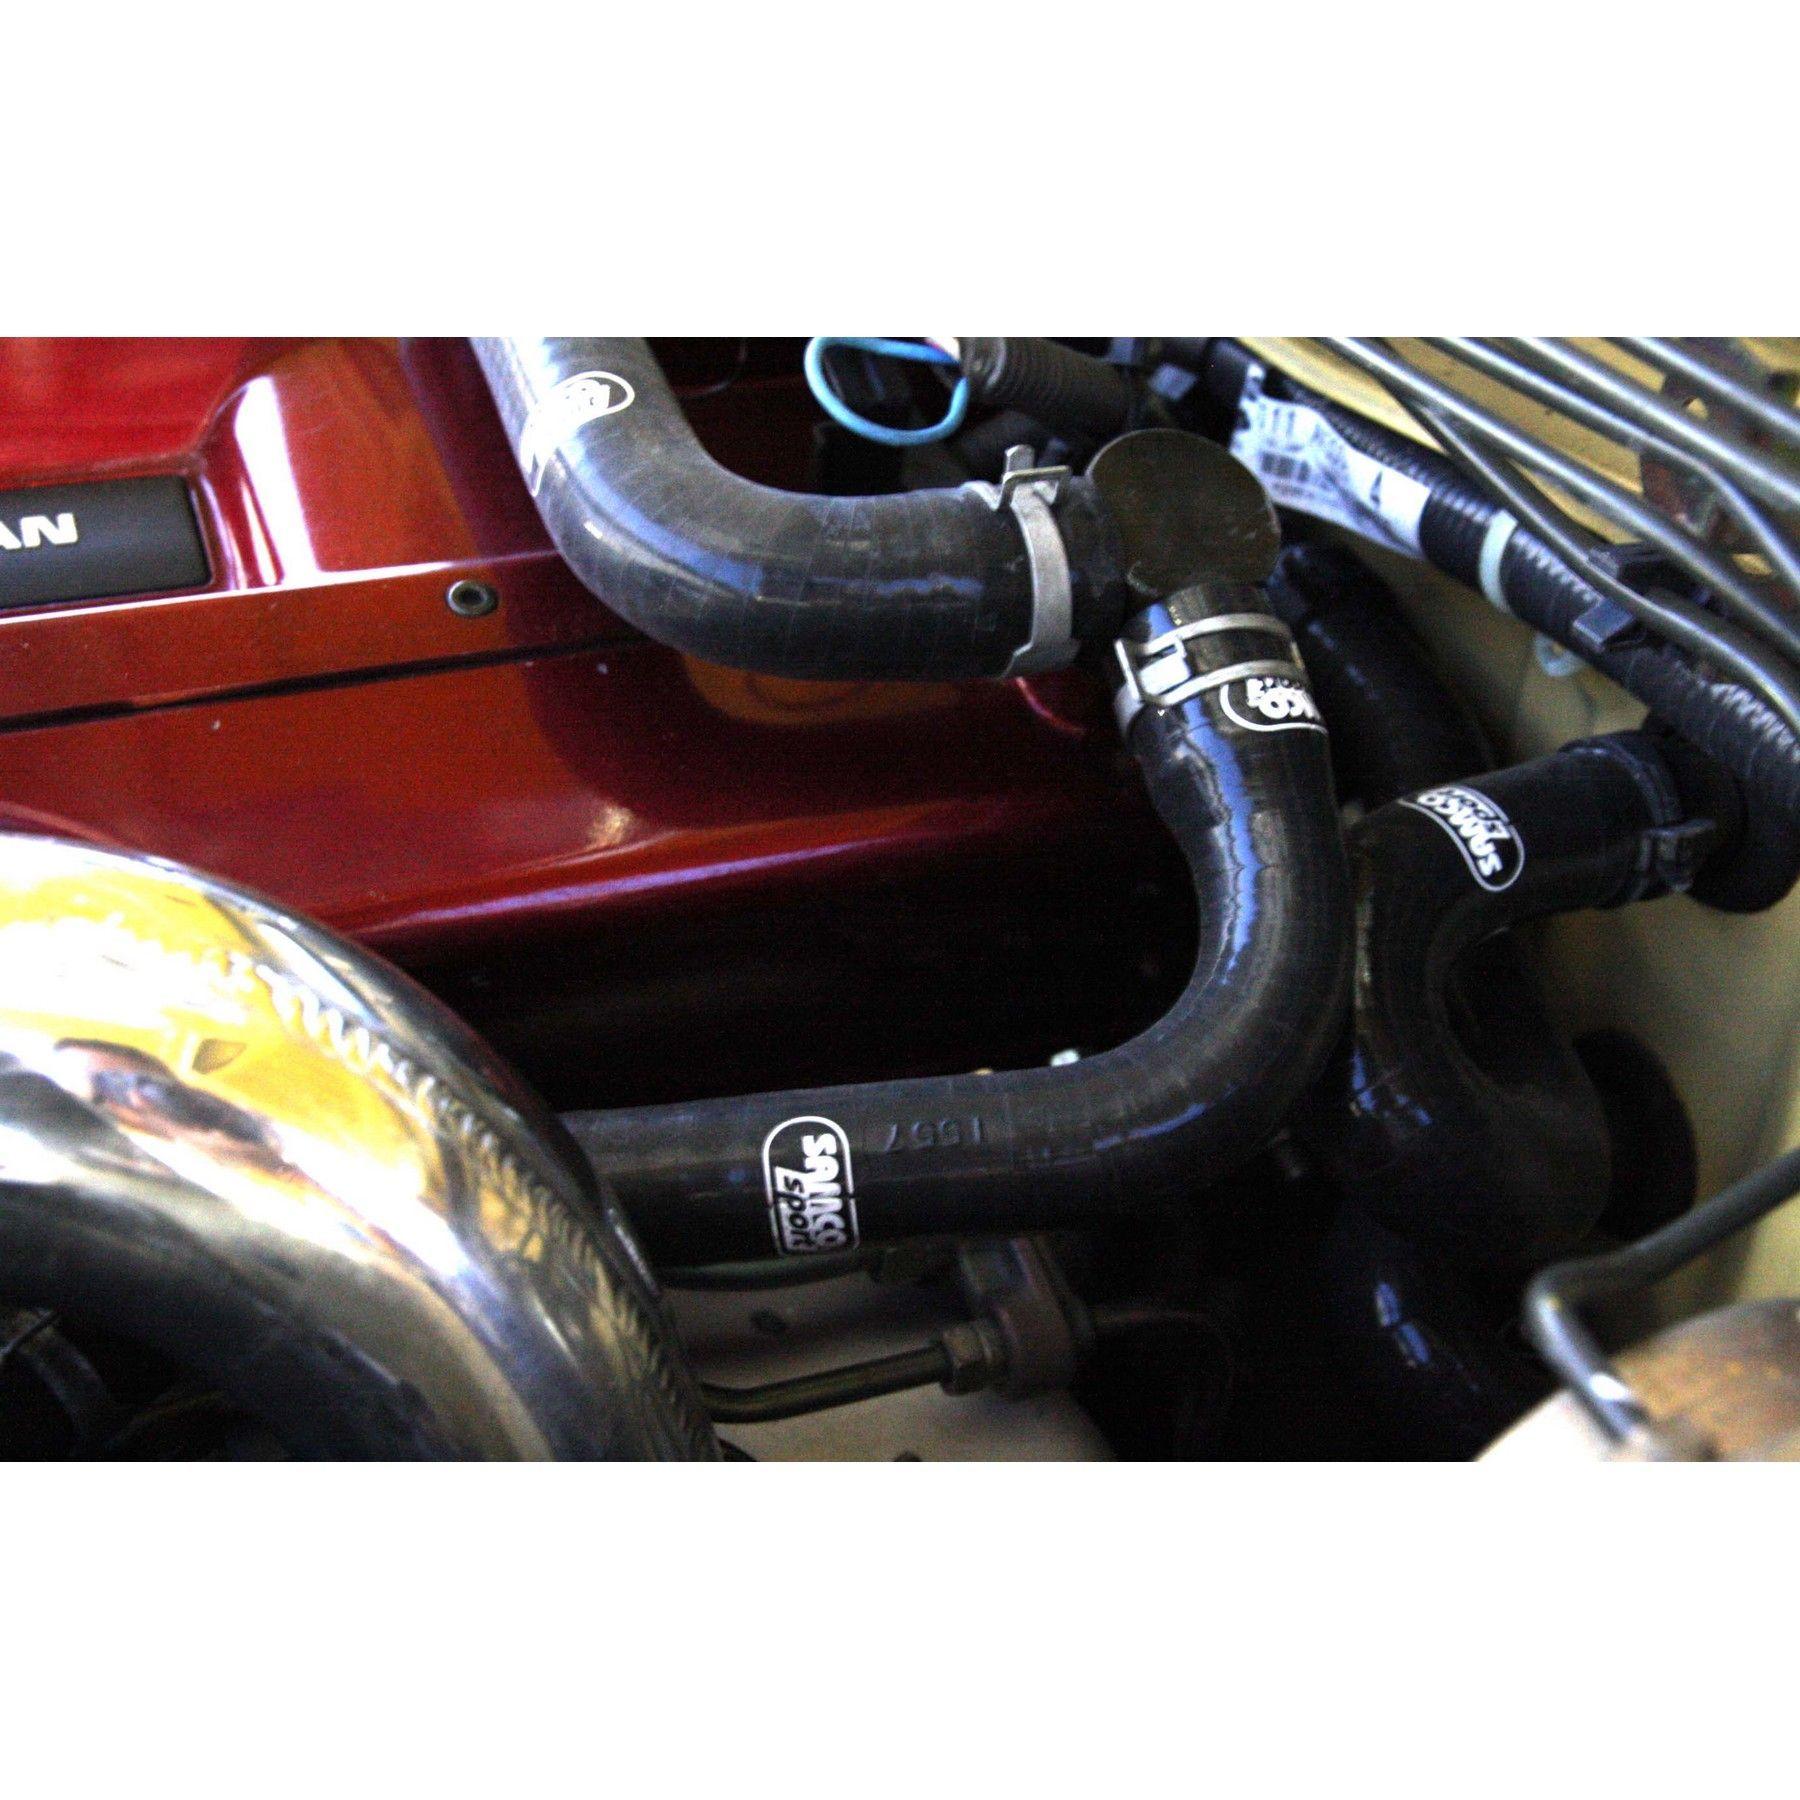 HON-47 fit Honda CR 125 R 2005-2012 Samco Silicon Rad Hoses